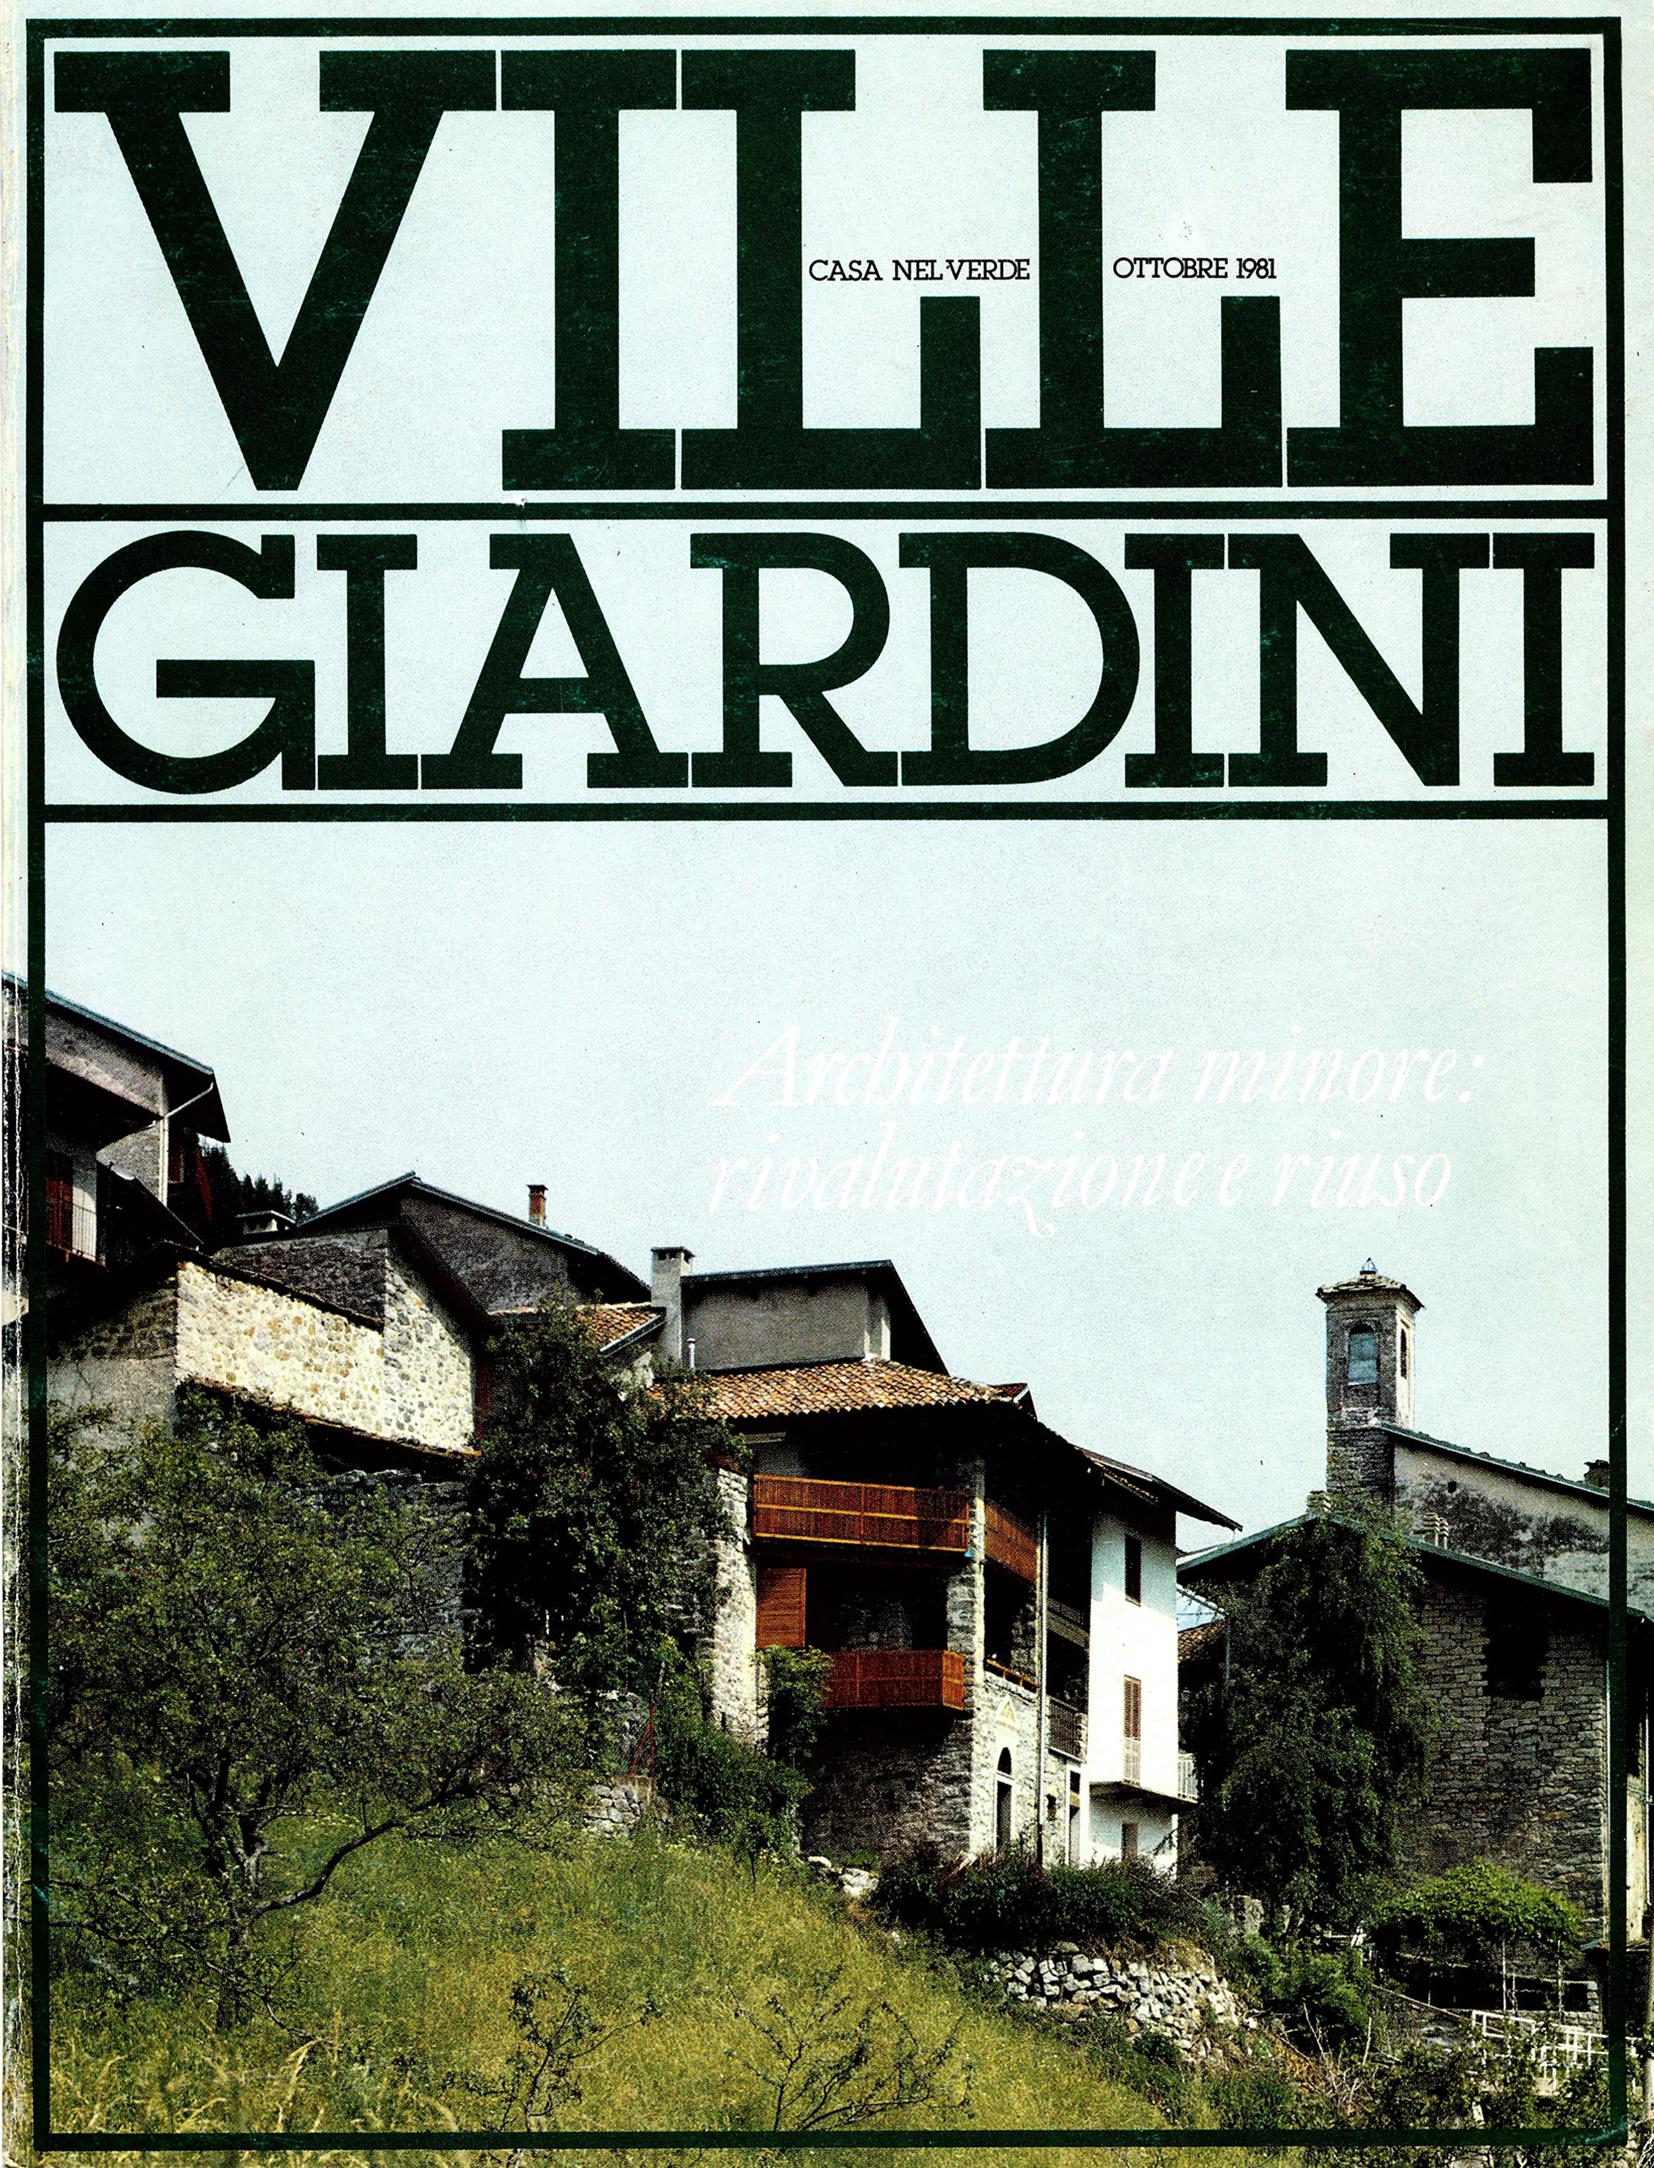 Ville e Giardini, Ottobre 1981